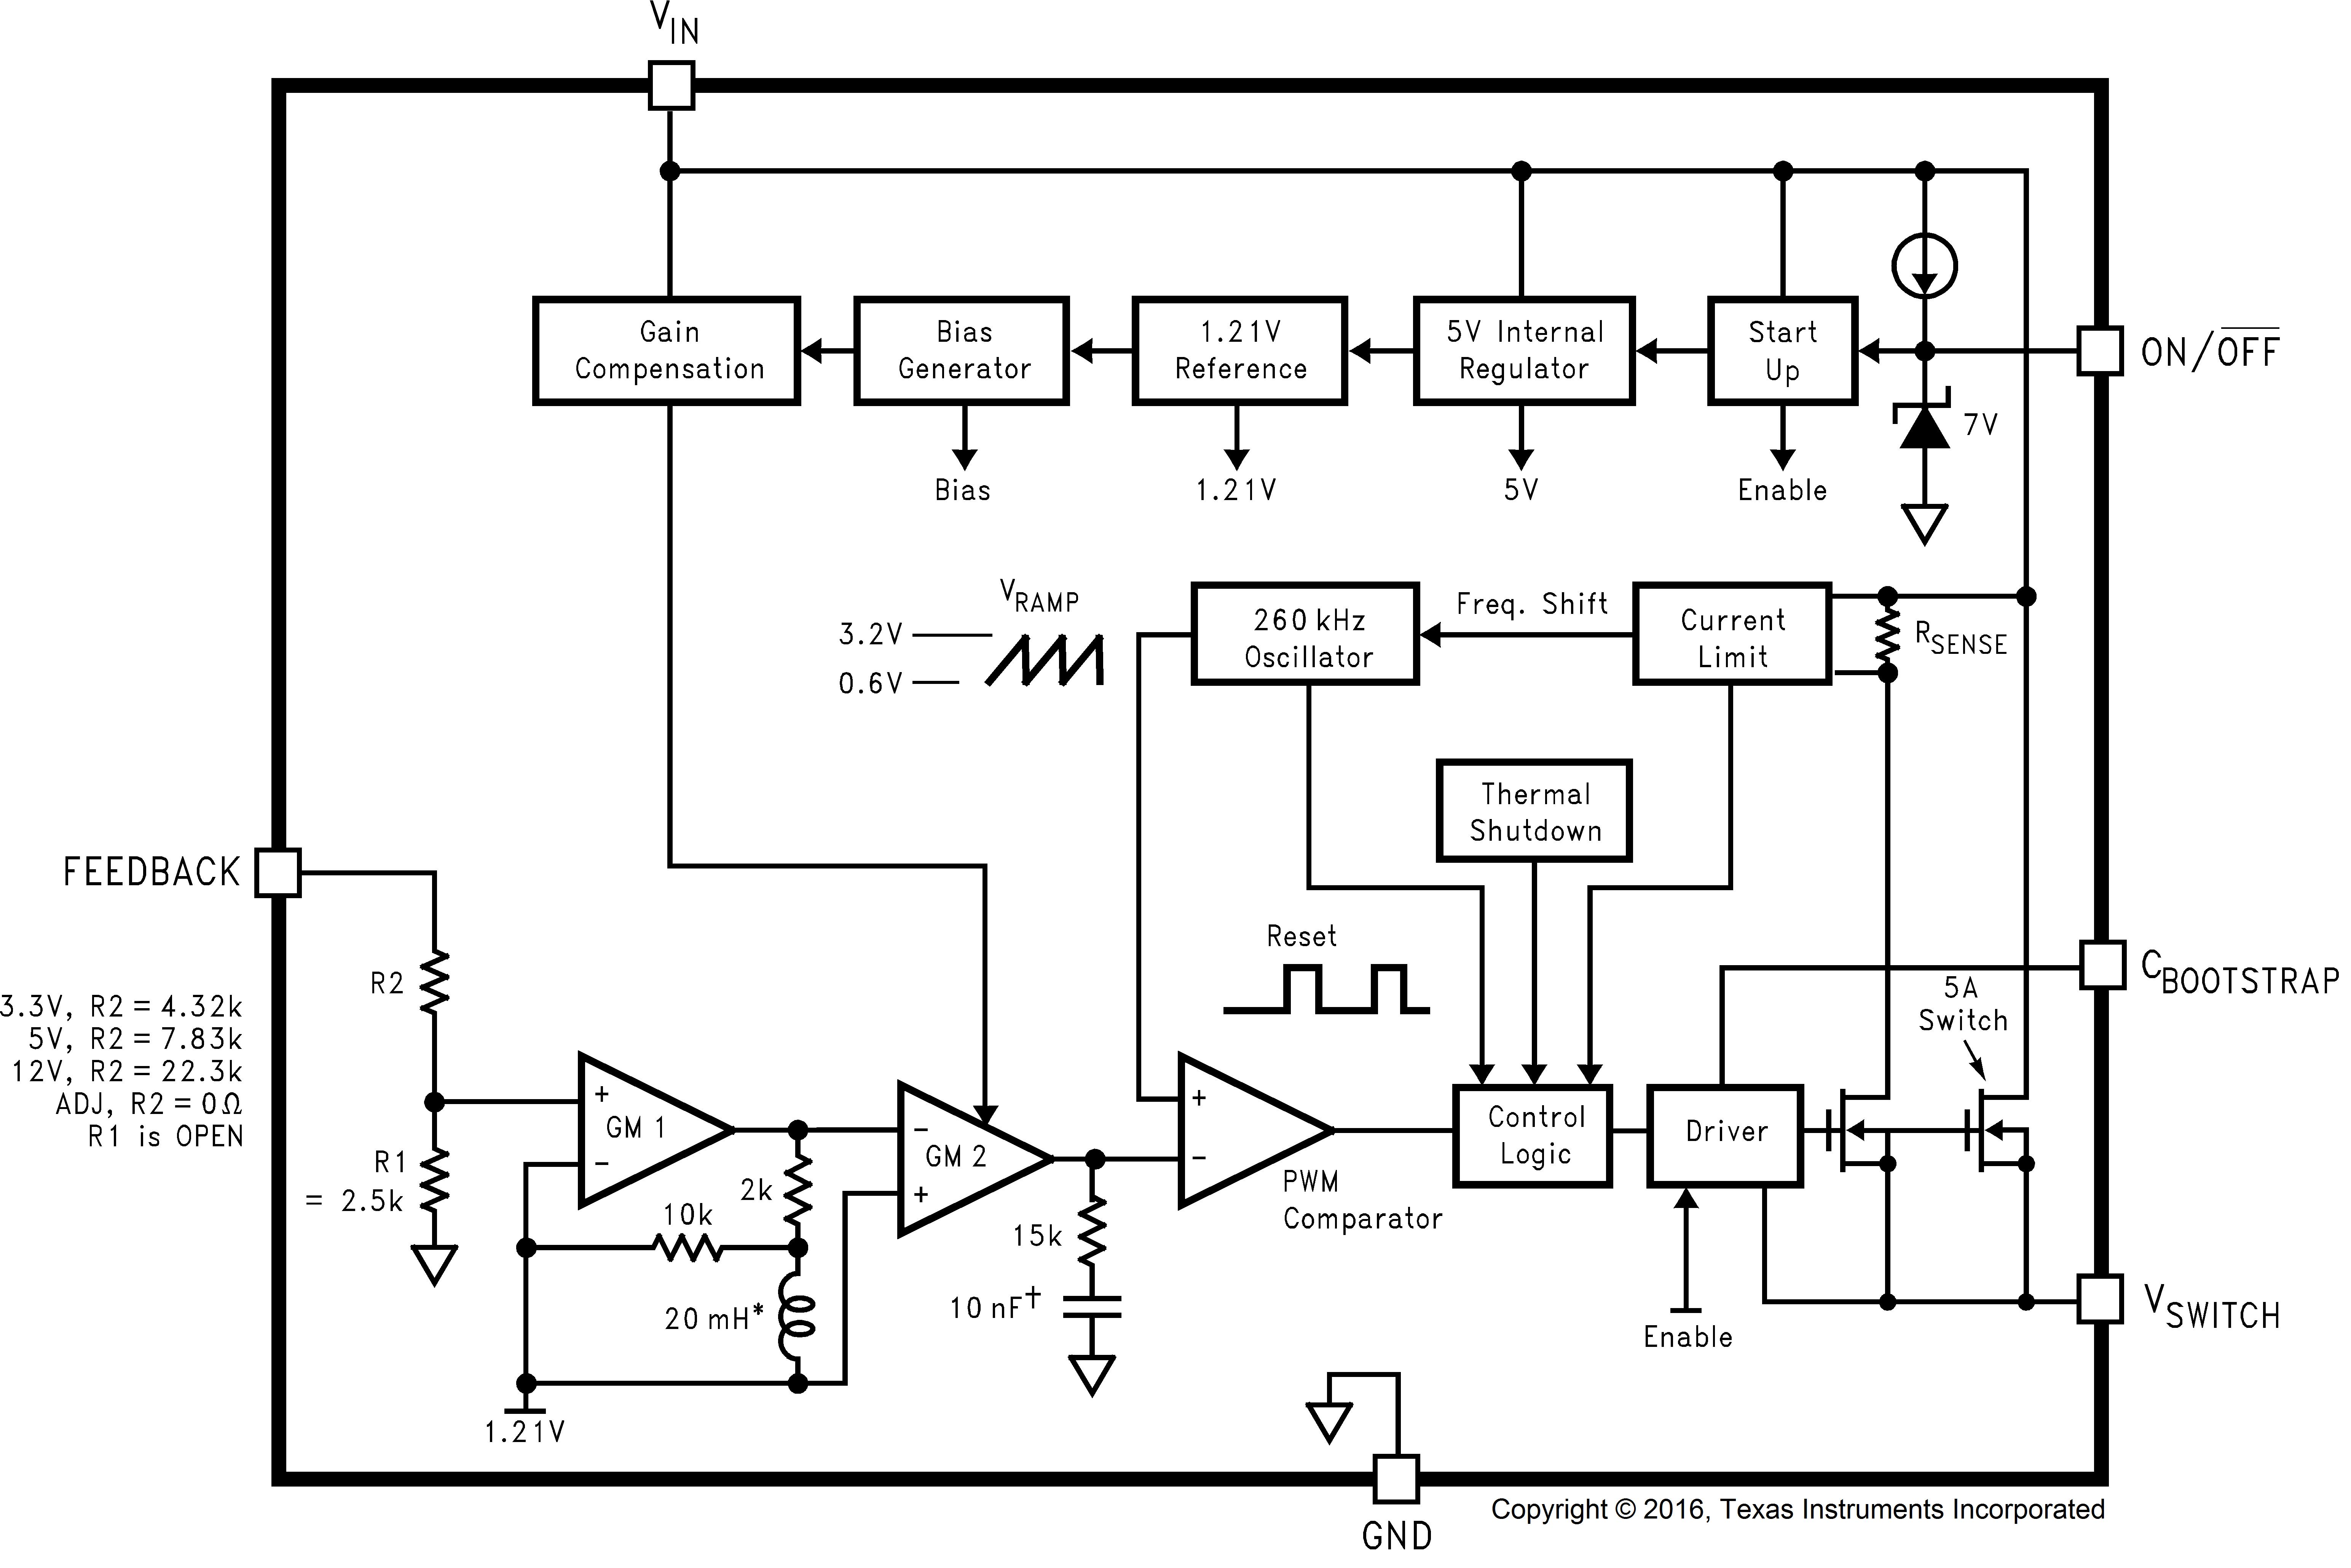 Simple Functional Block Diagram Trusted Wiring Diagrams Lm2678 Tij Co Jp Digital Filter